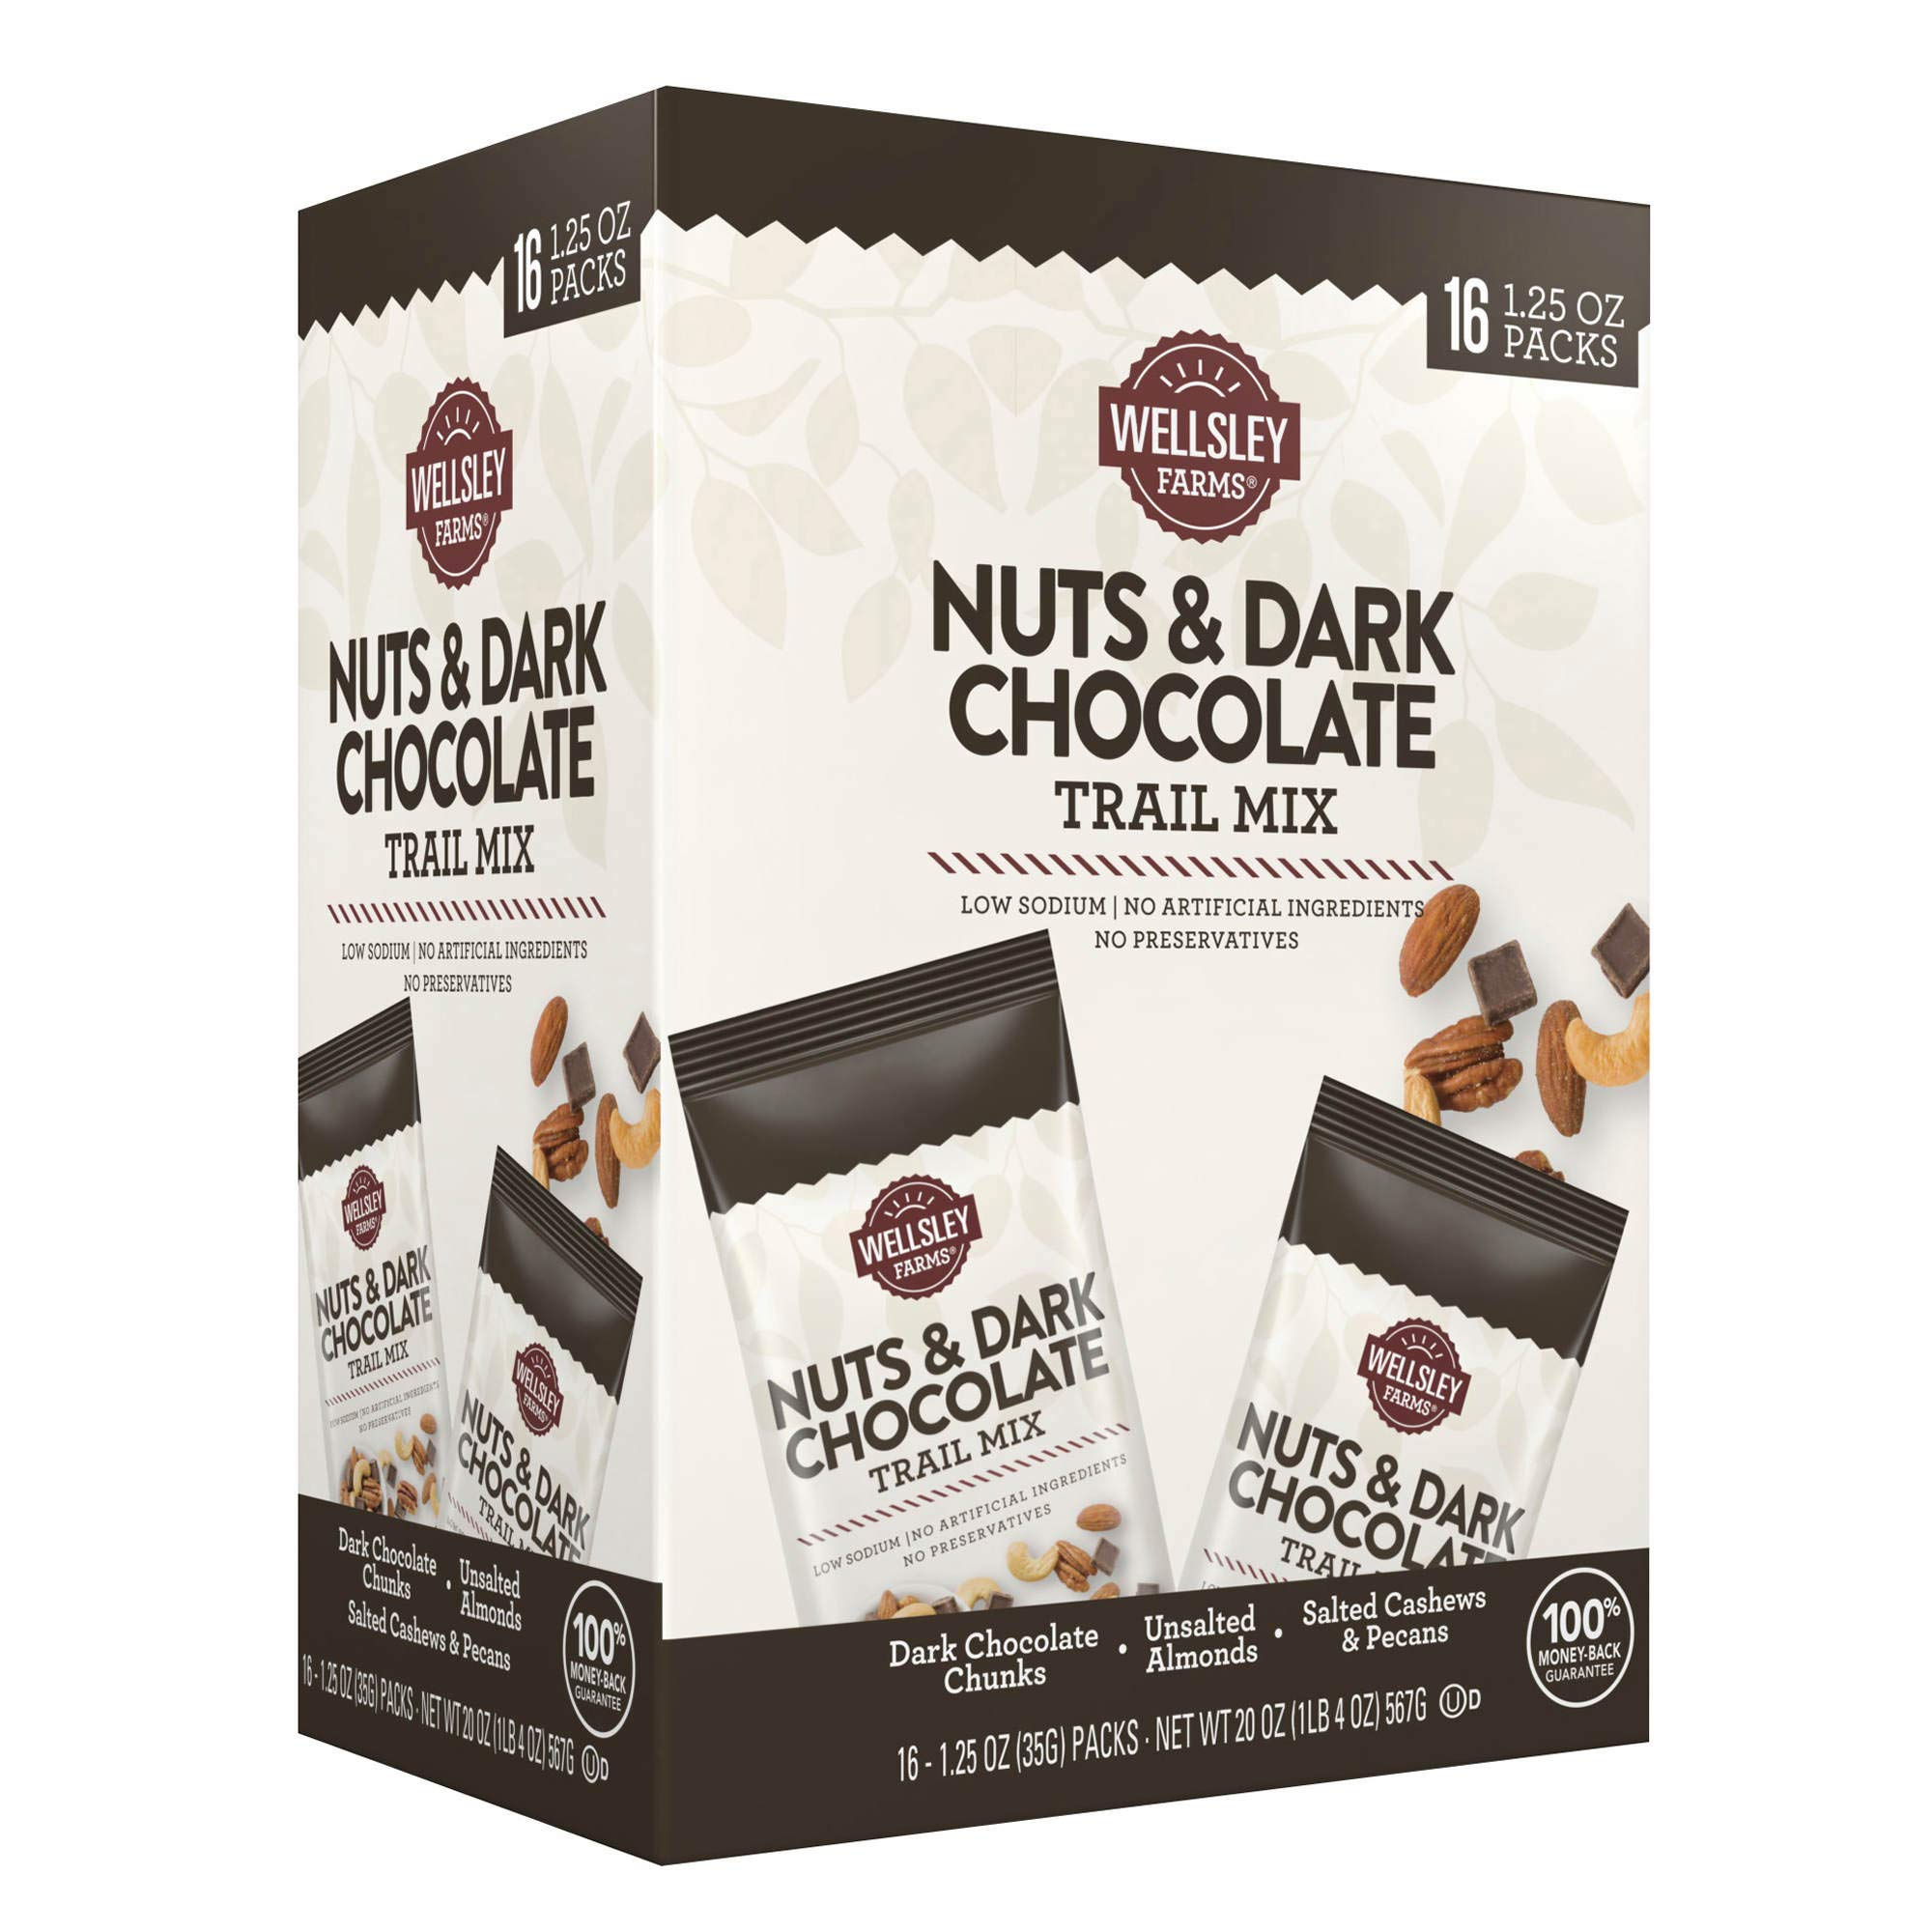 Wellsley farms nuts&dark chocolate trail mix